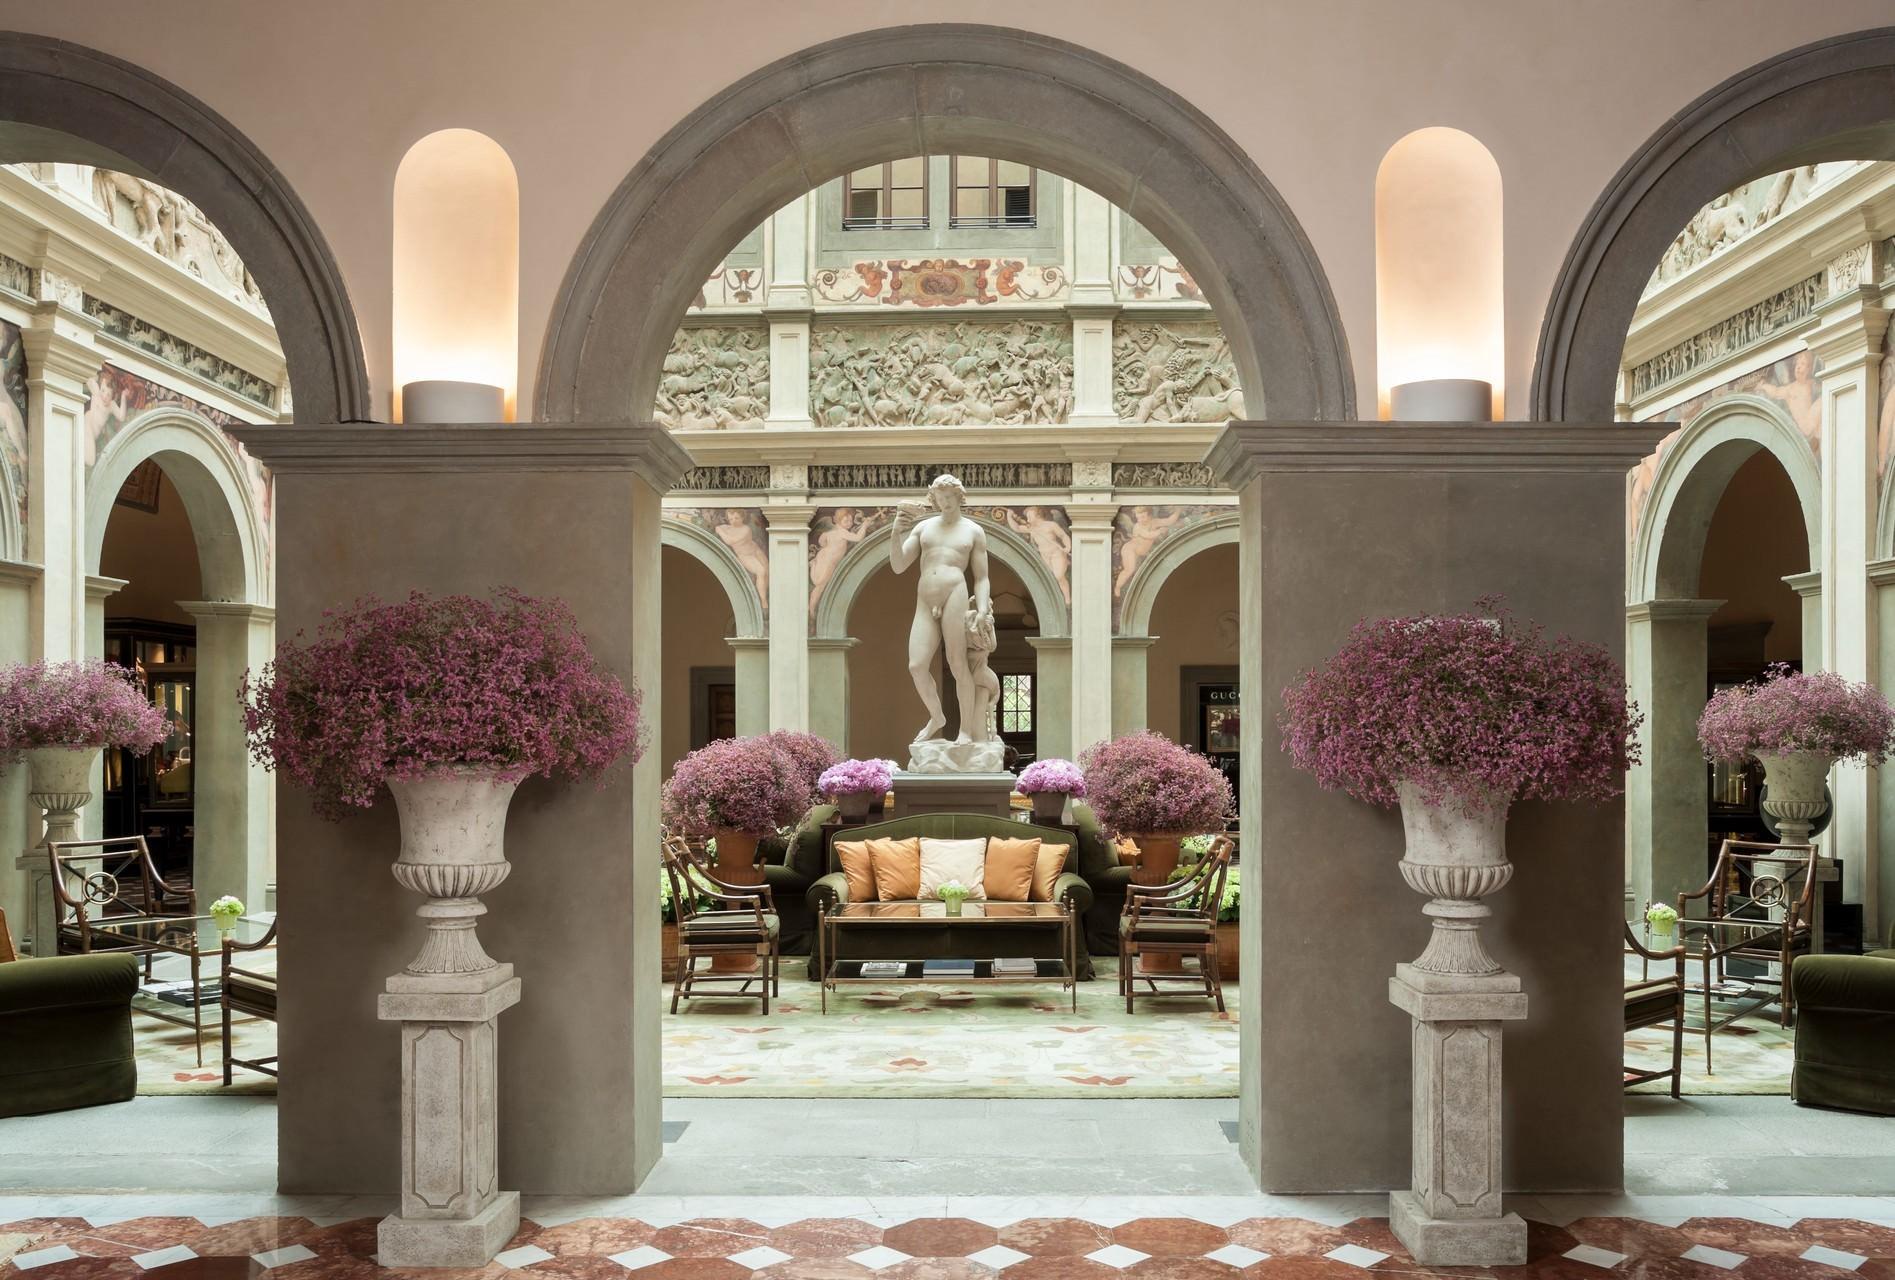 Four Seasons Hotel Firenze, Lobby